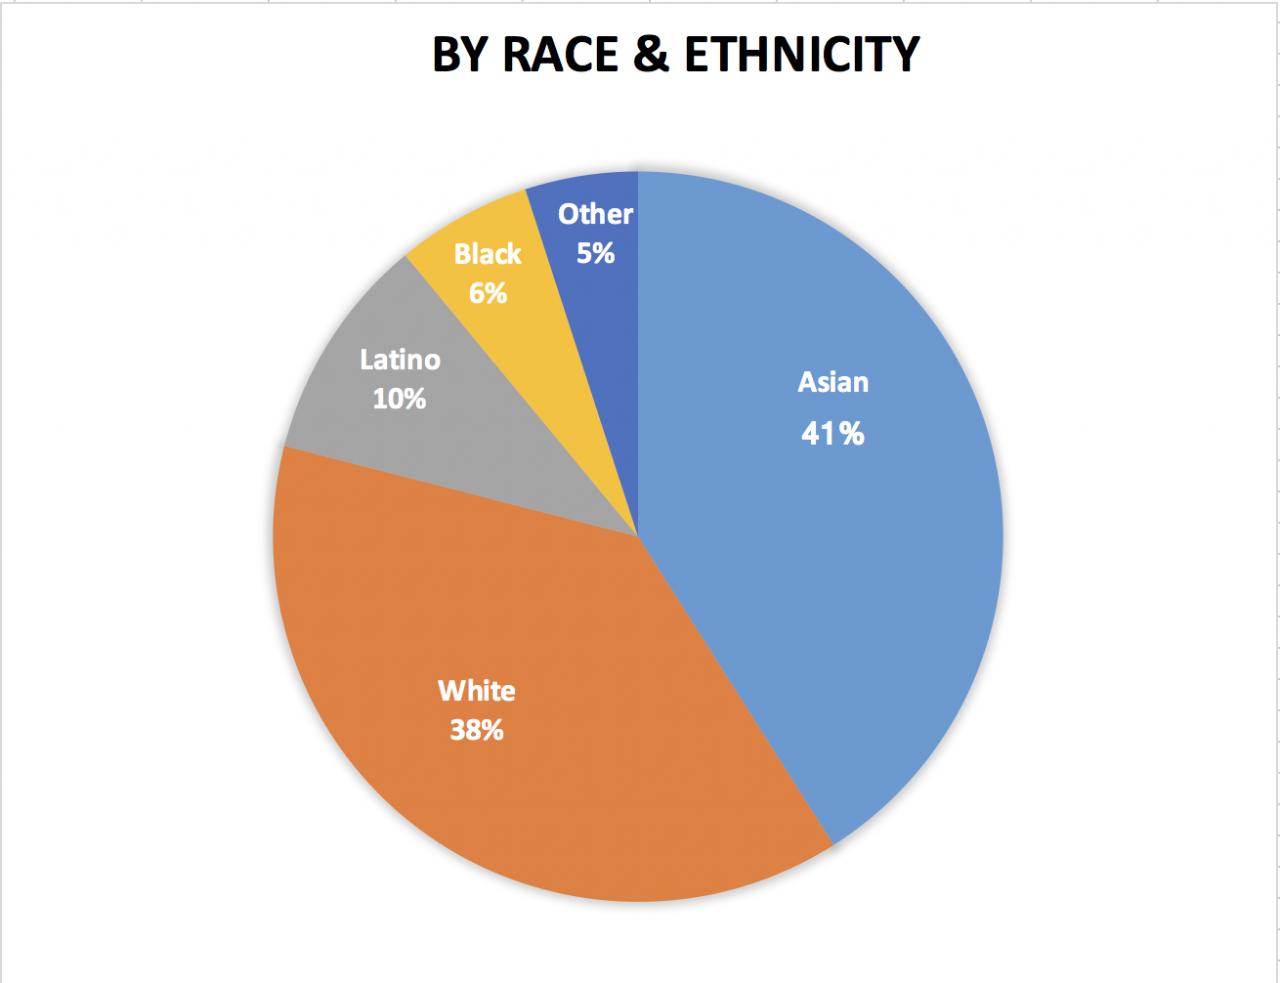 41% Asian, 38% White, 10% Latino/Latina, 6% Black, 5% Other